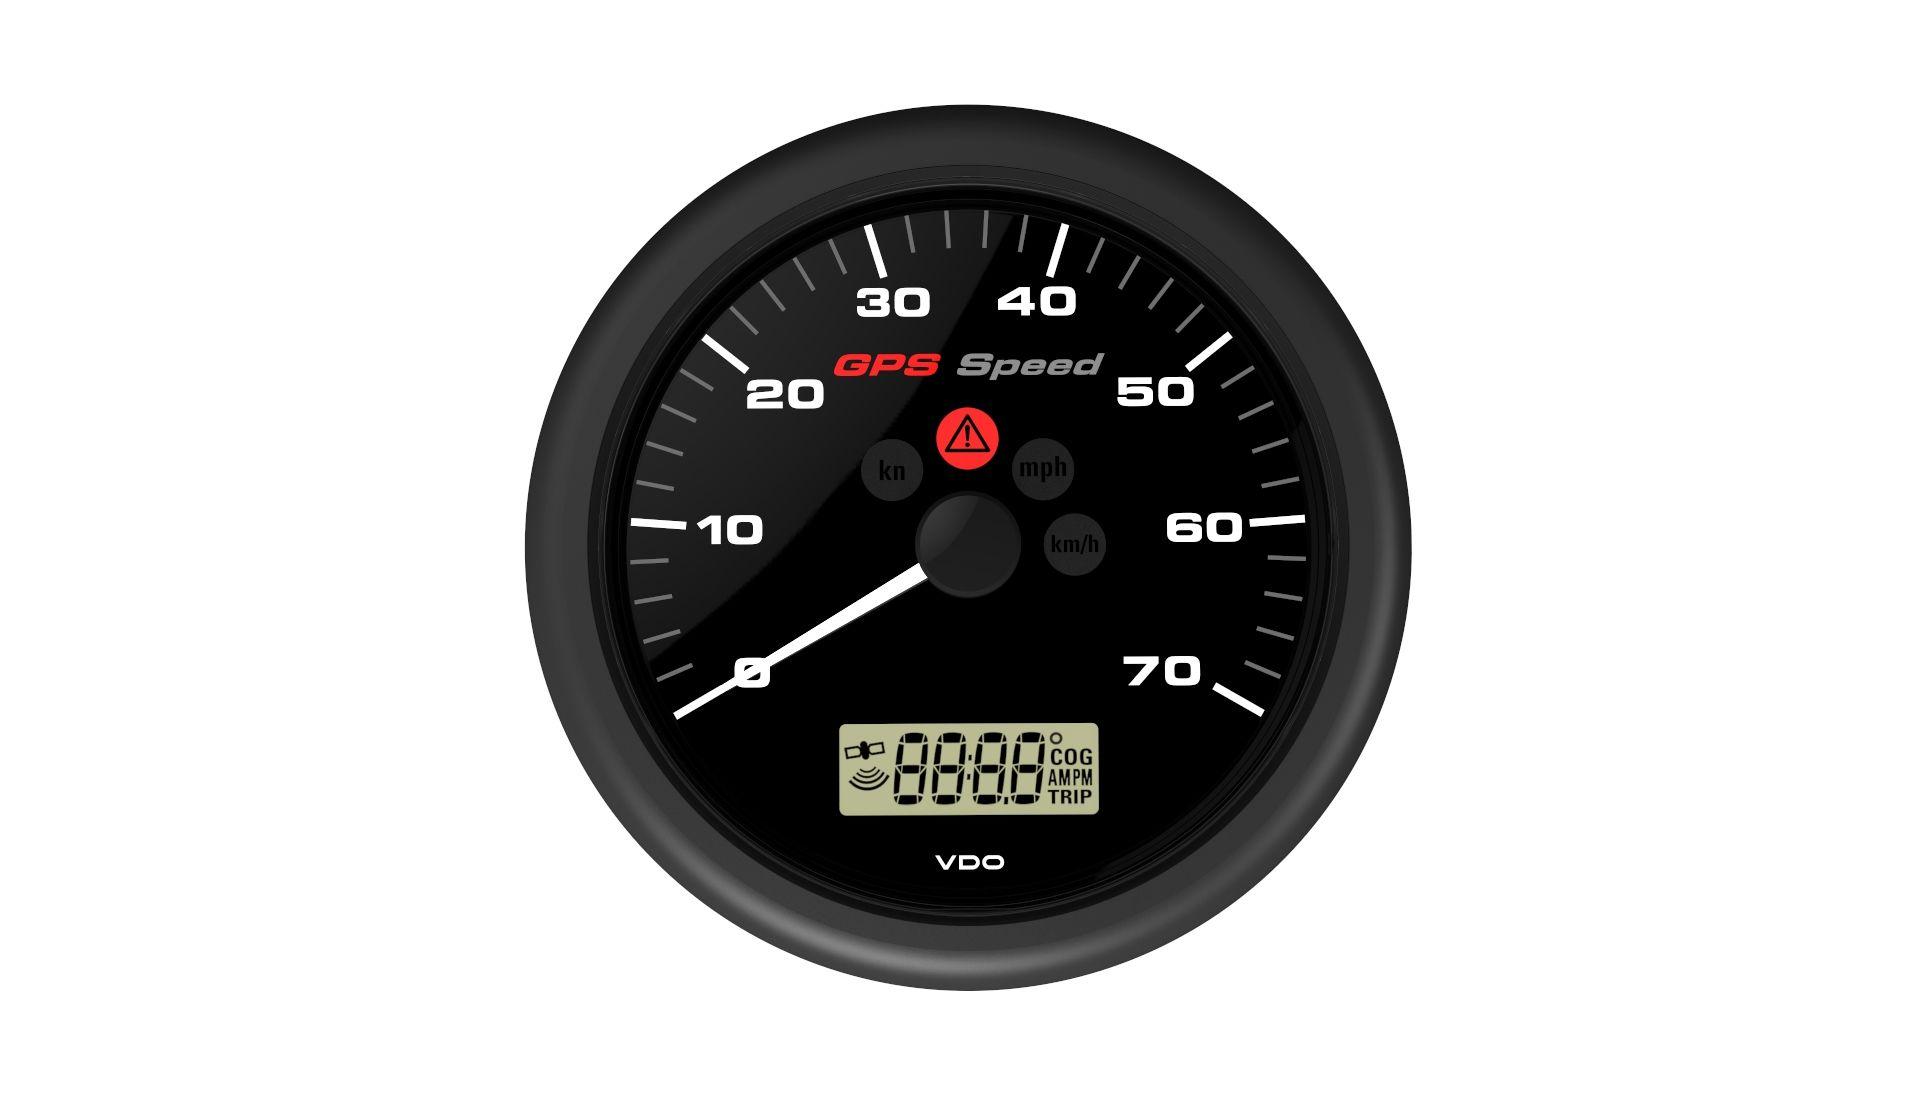 VDO GPS Speedometer